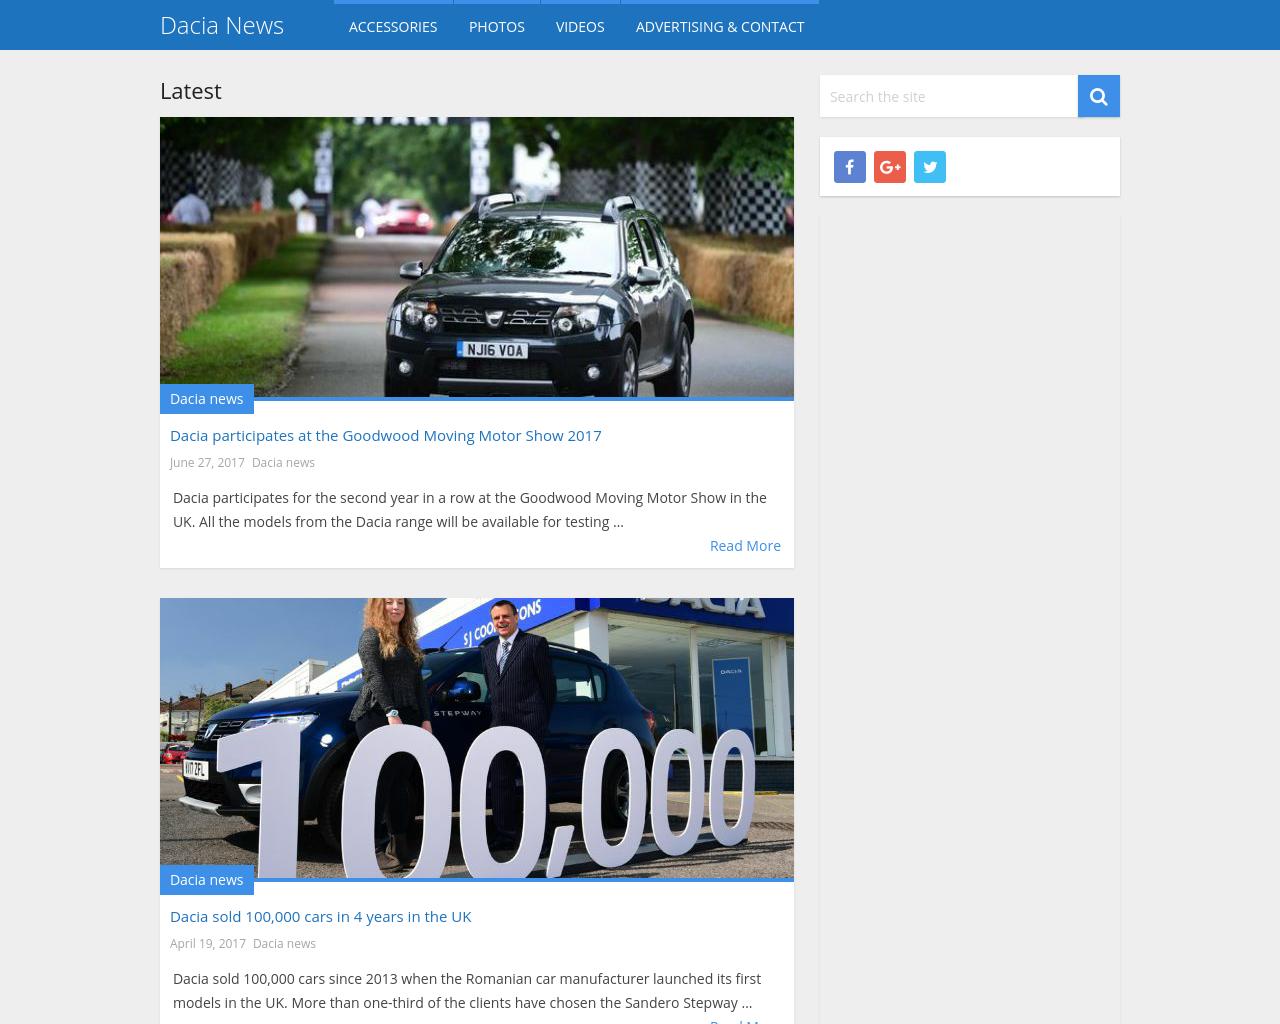 Dacia-News-Advertising-Reviews-Pricing